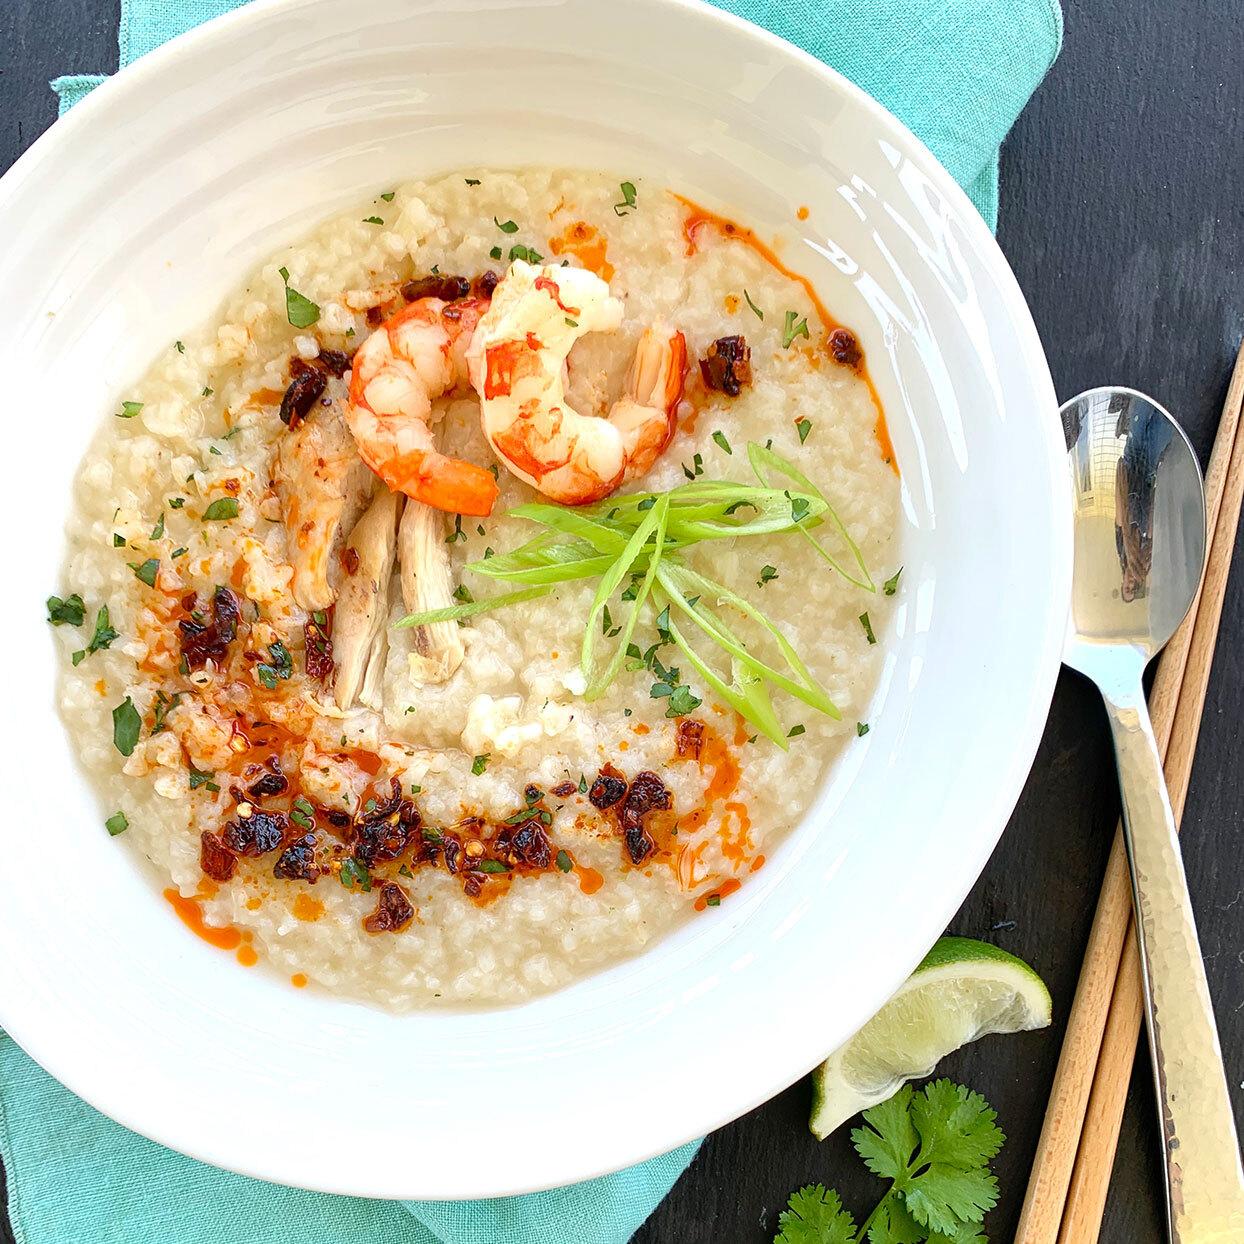 Shrimp & Chicken Congee Trusted Brands